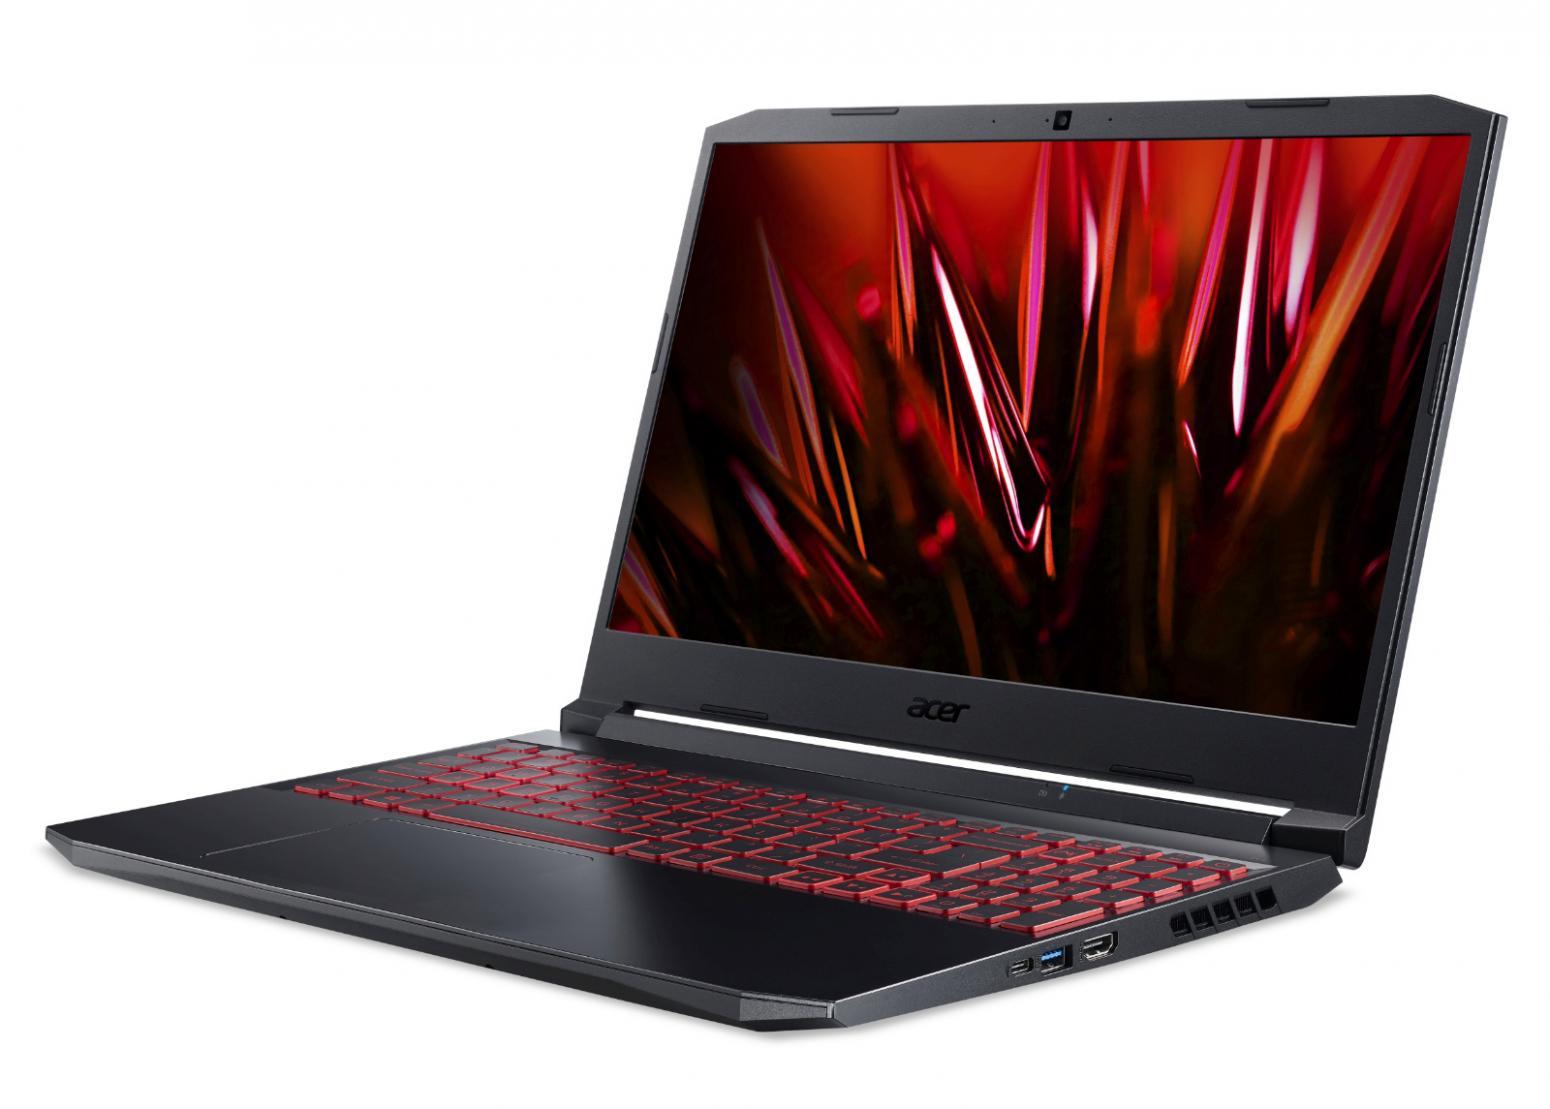 Ordinateur portable Acer Nitro 5 AN515-45-R90U - RTX 3080, 360Hz - photo 3